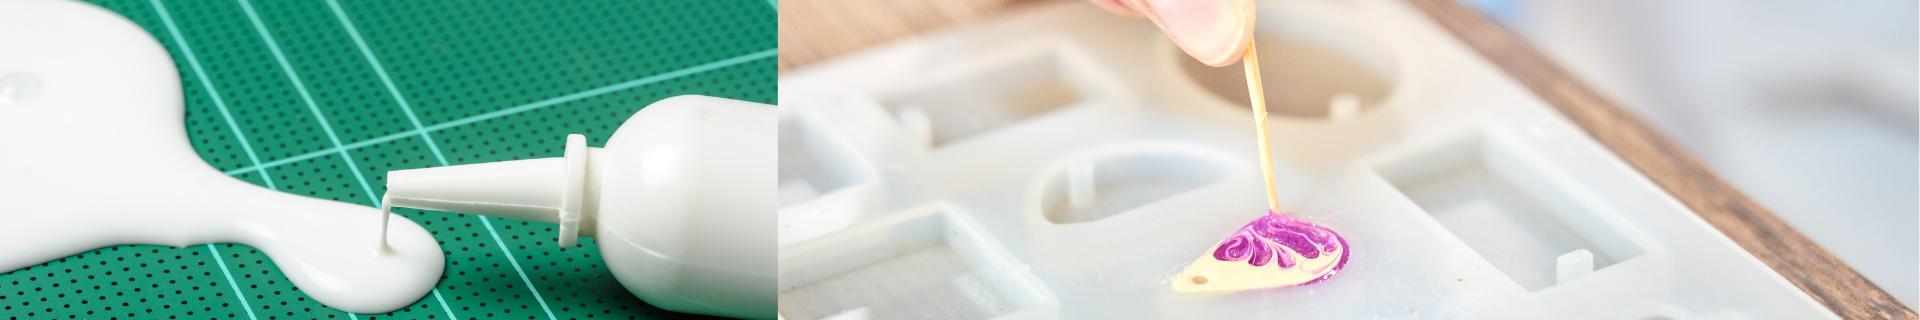 Lattice e resine per stampi